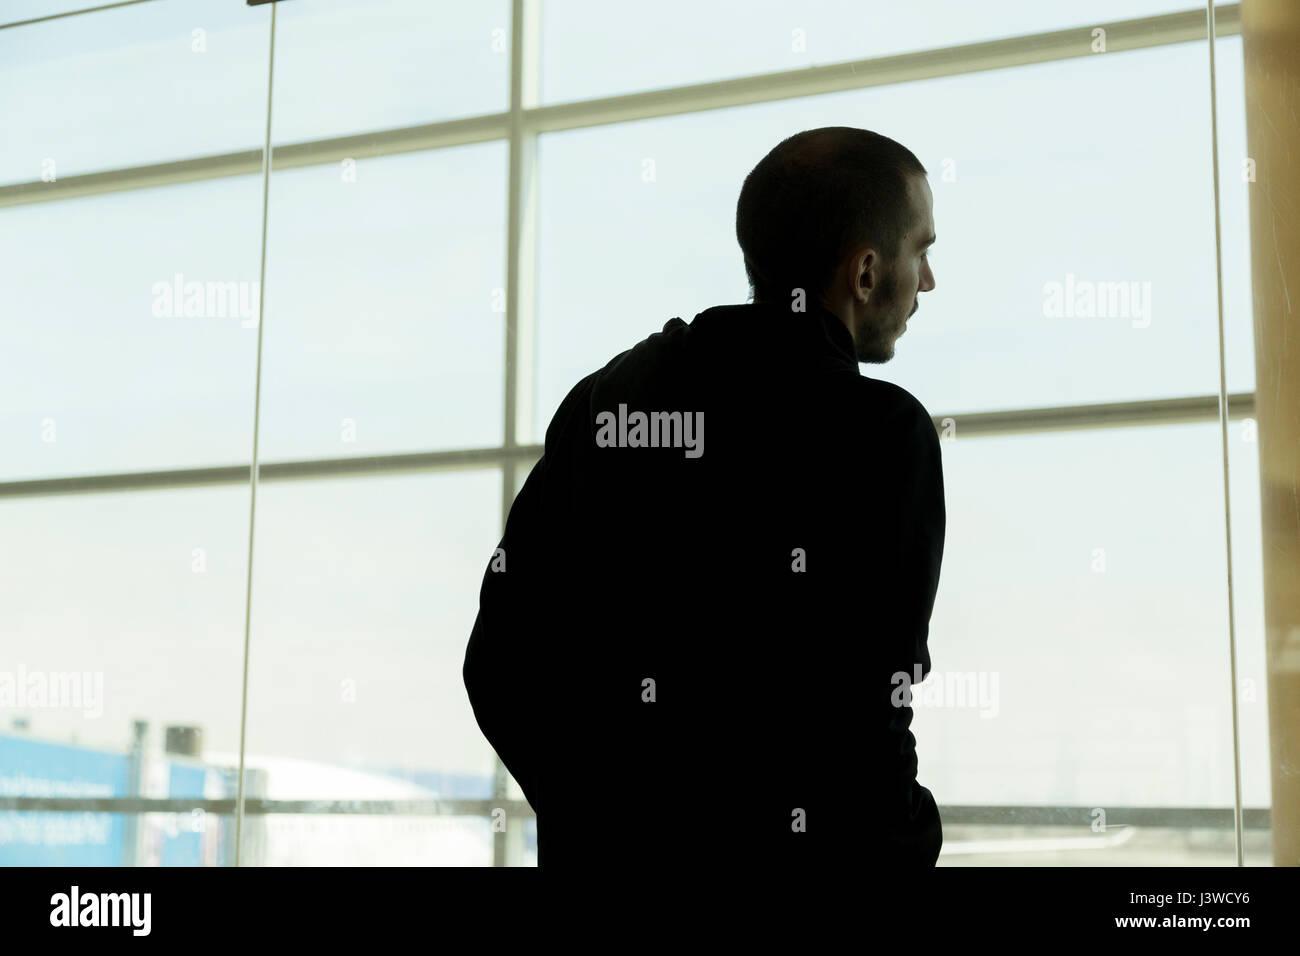 Man looking through window - Stock Image